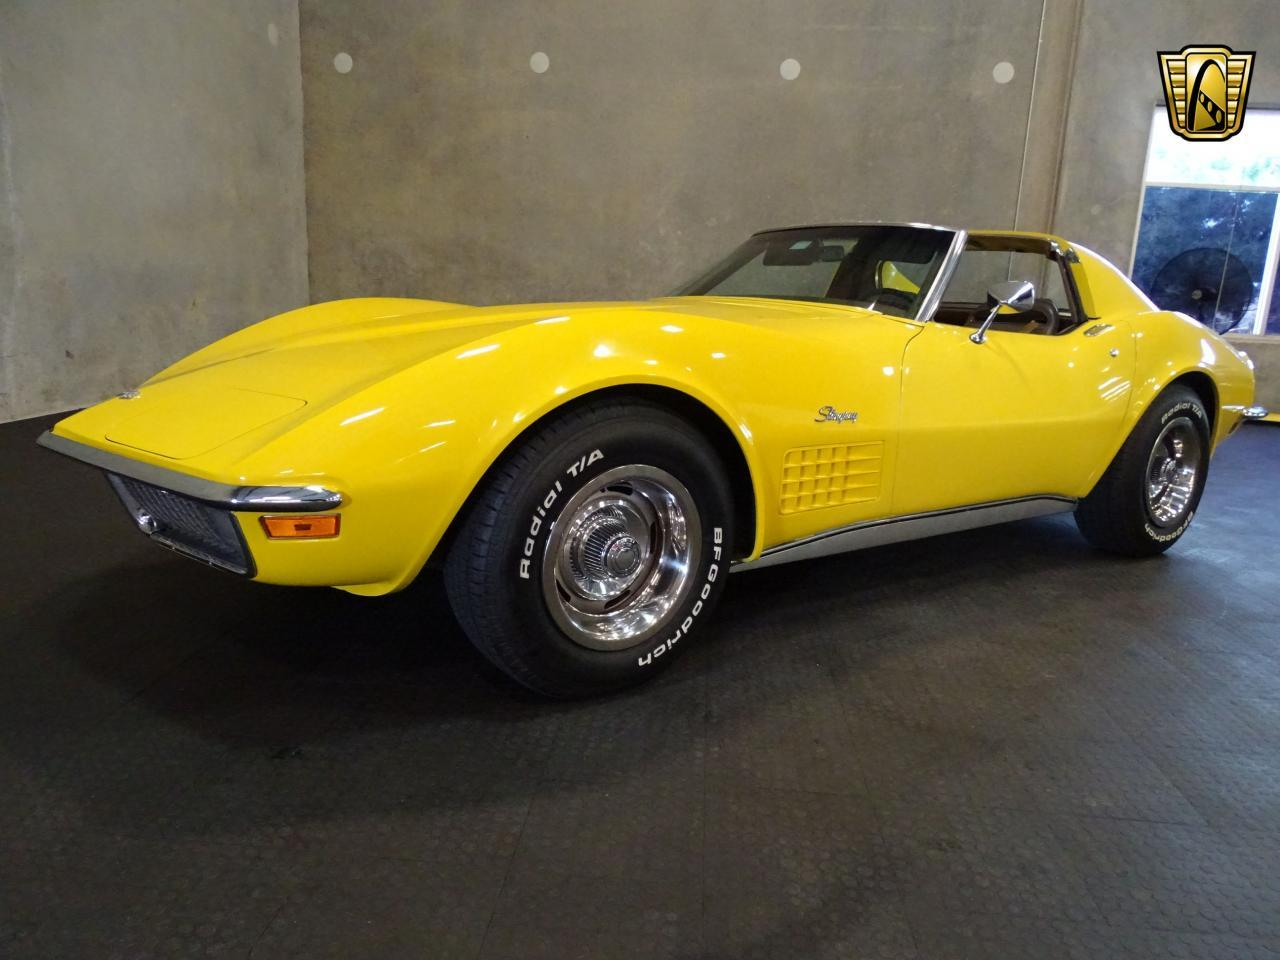 Large Picture of Classic 1971 Corvette located in Florida - $28,995.00 - LOPO